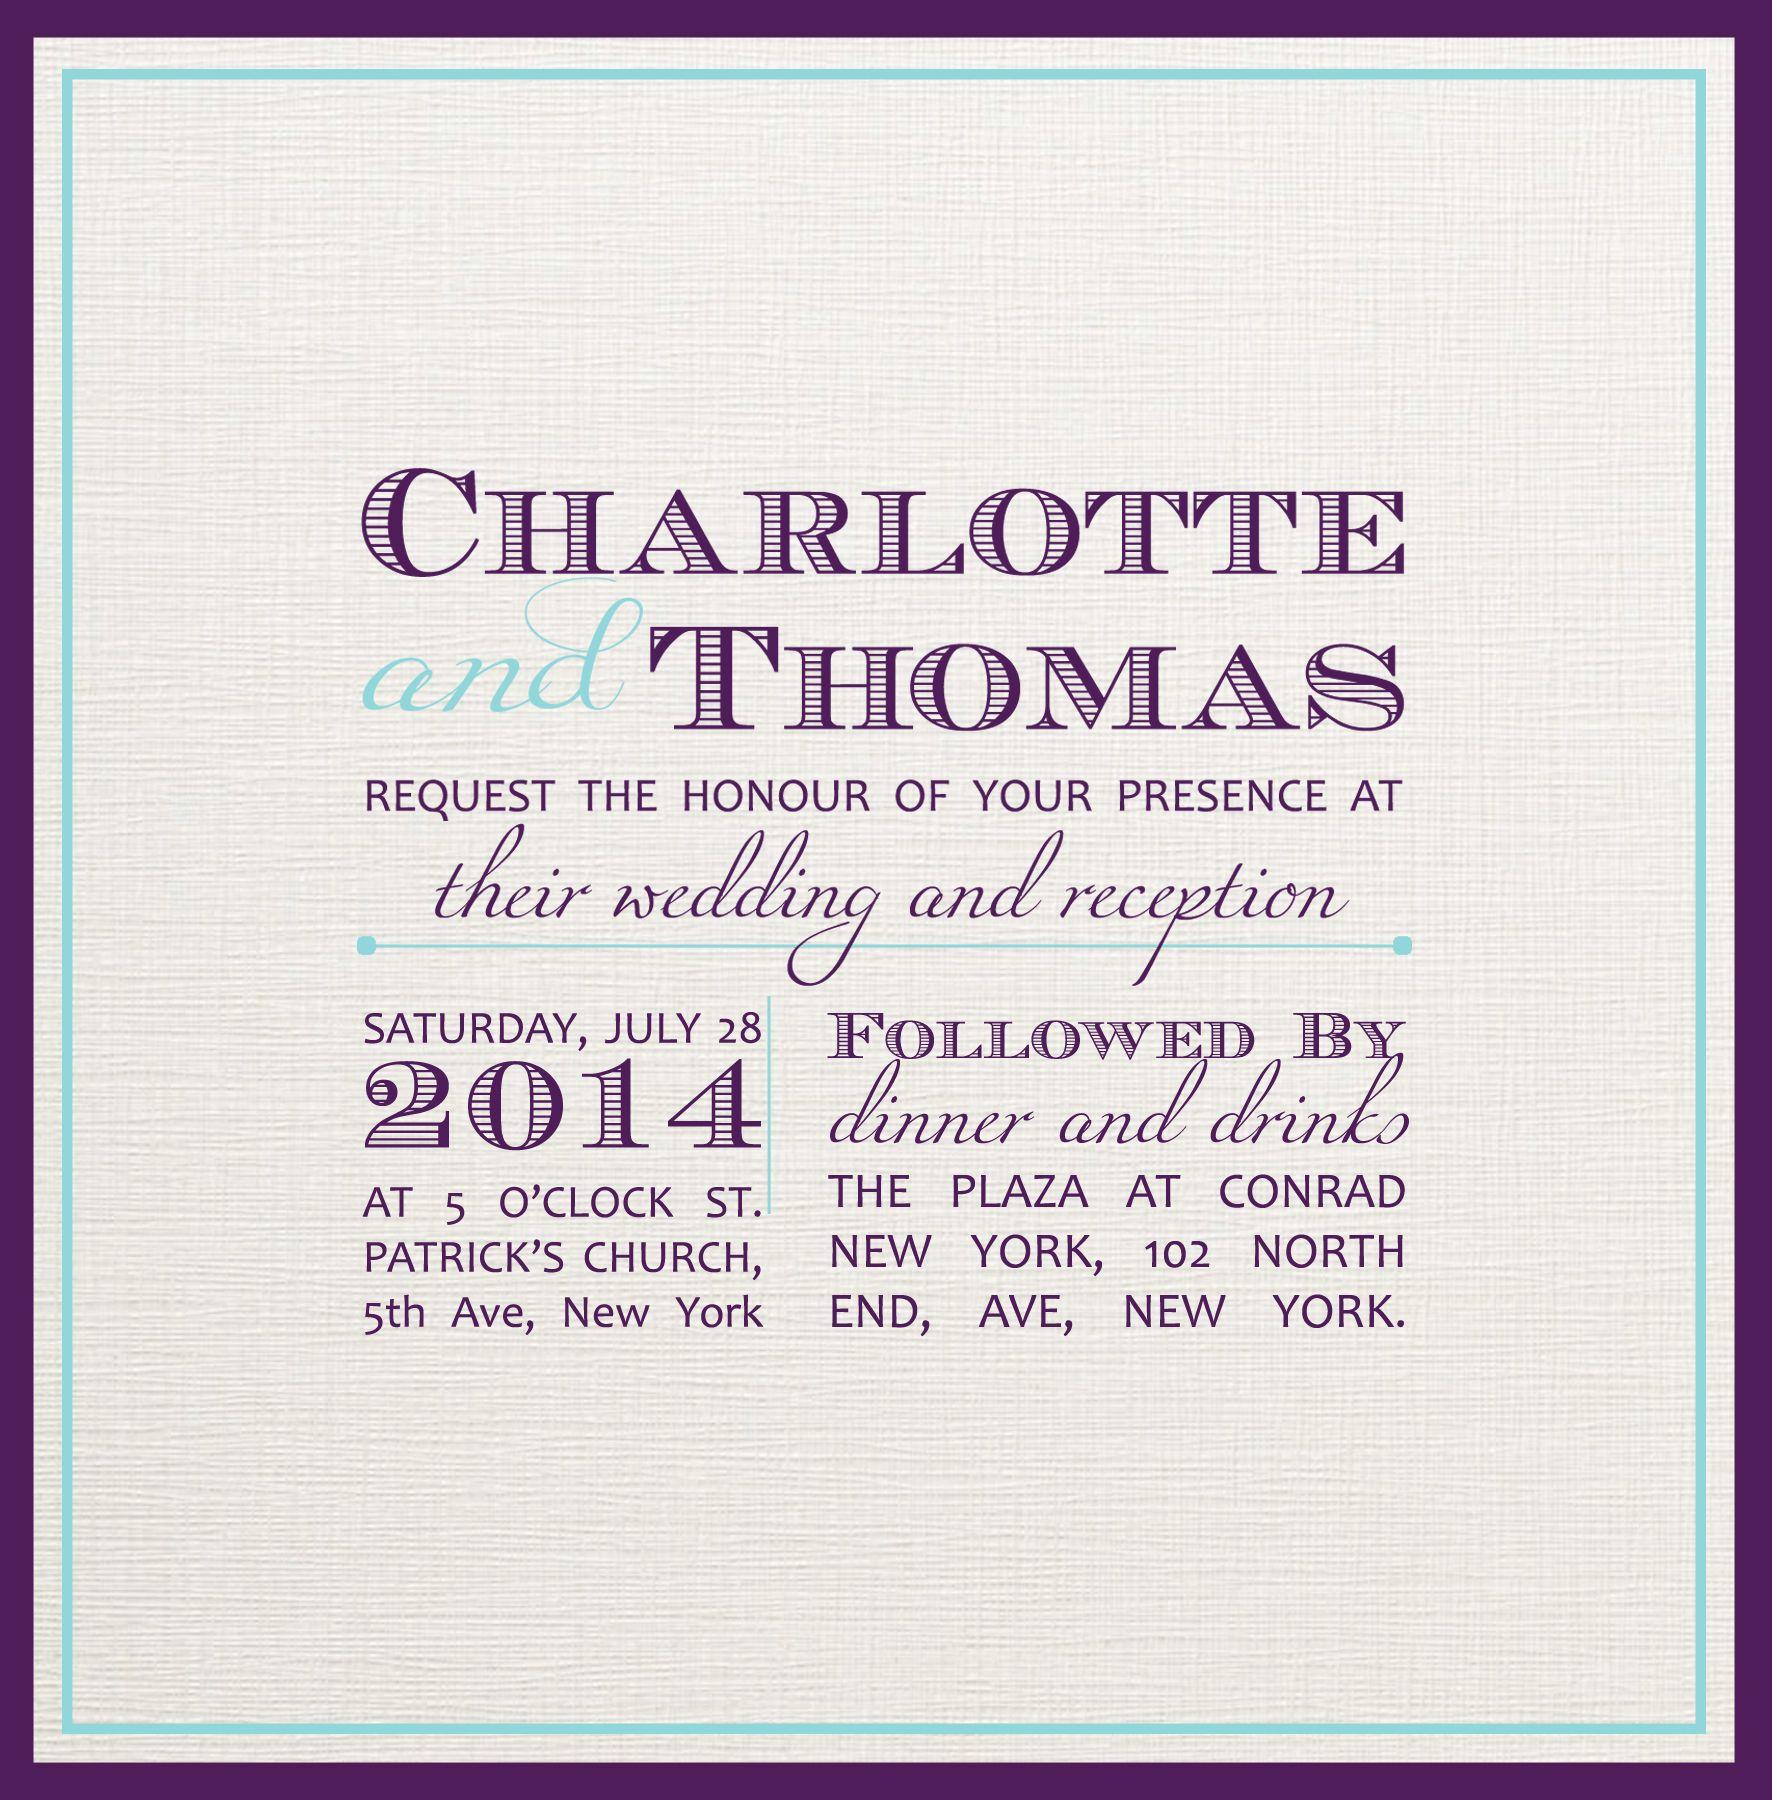 Wedding Invitation  Fonts Used- Candara, Miama & Ecuyer DAX